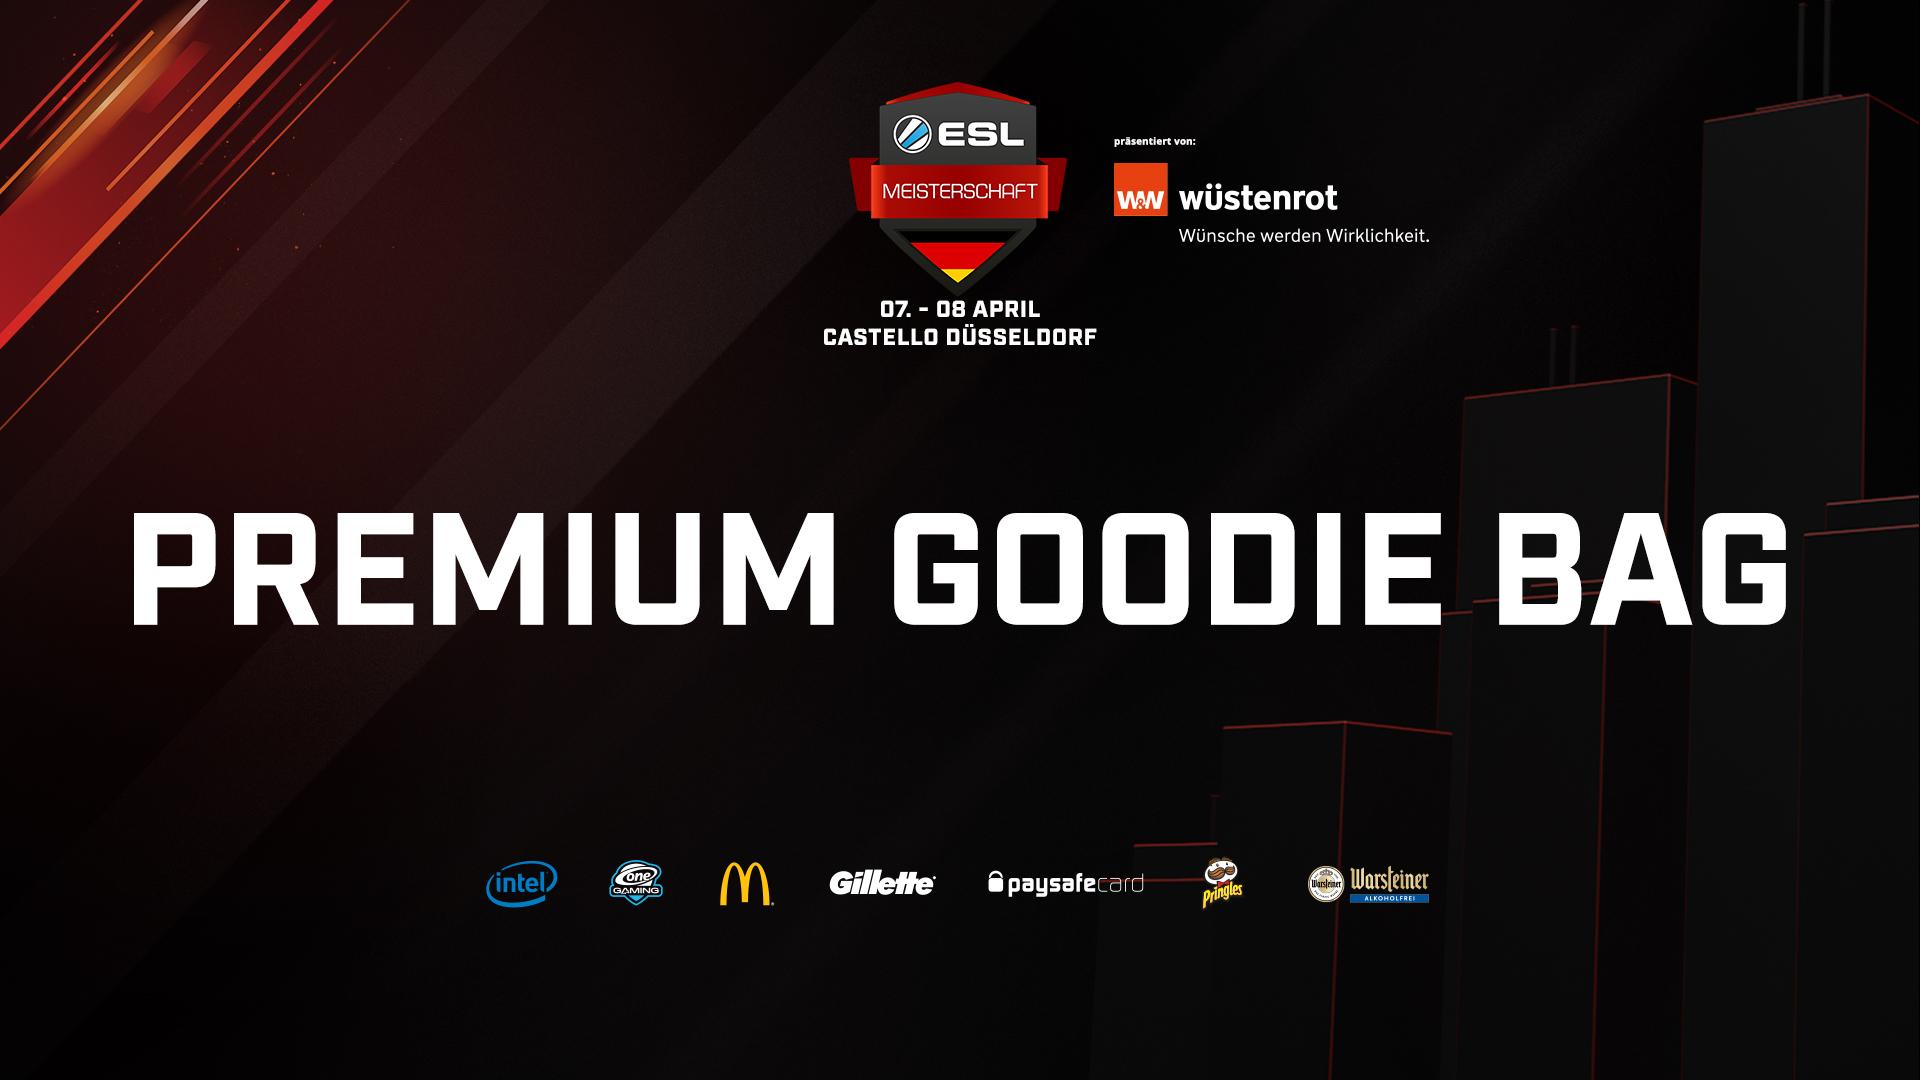 Die Goodie Bag der ESL Frühlingsmeisterschaft 2018